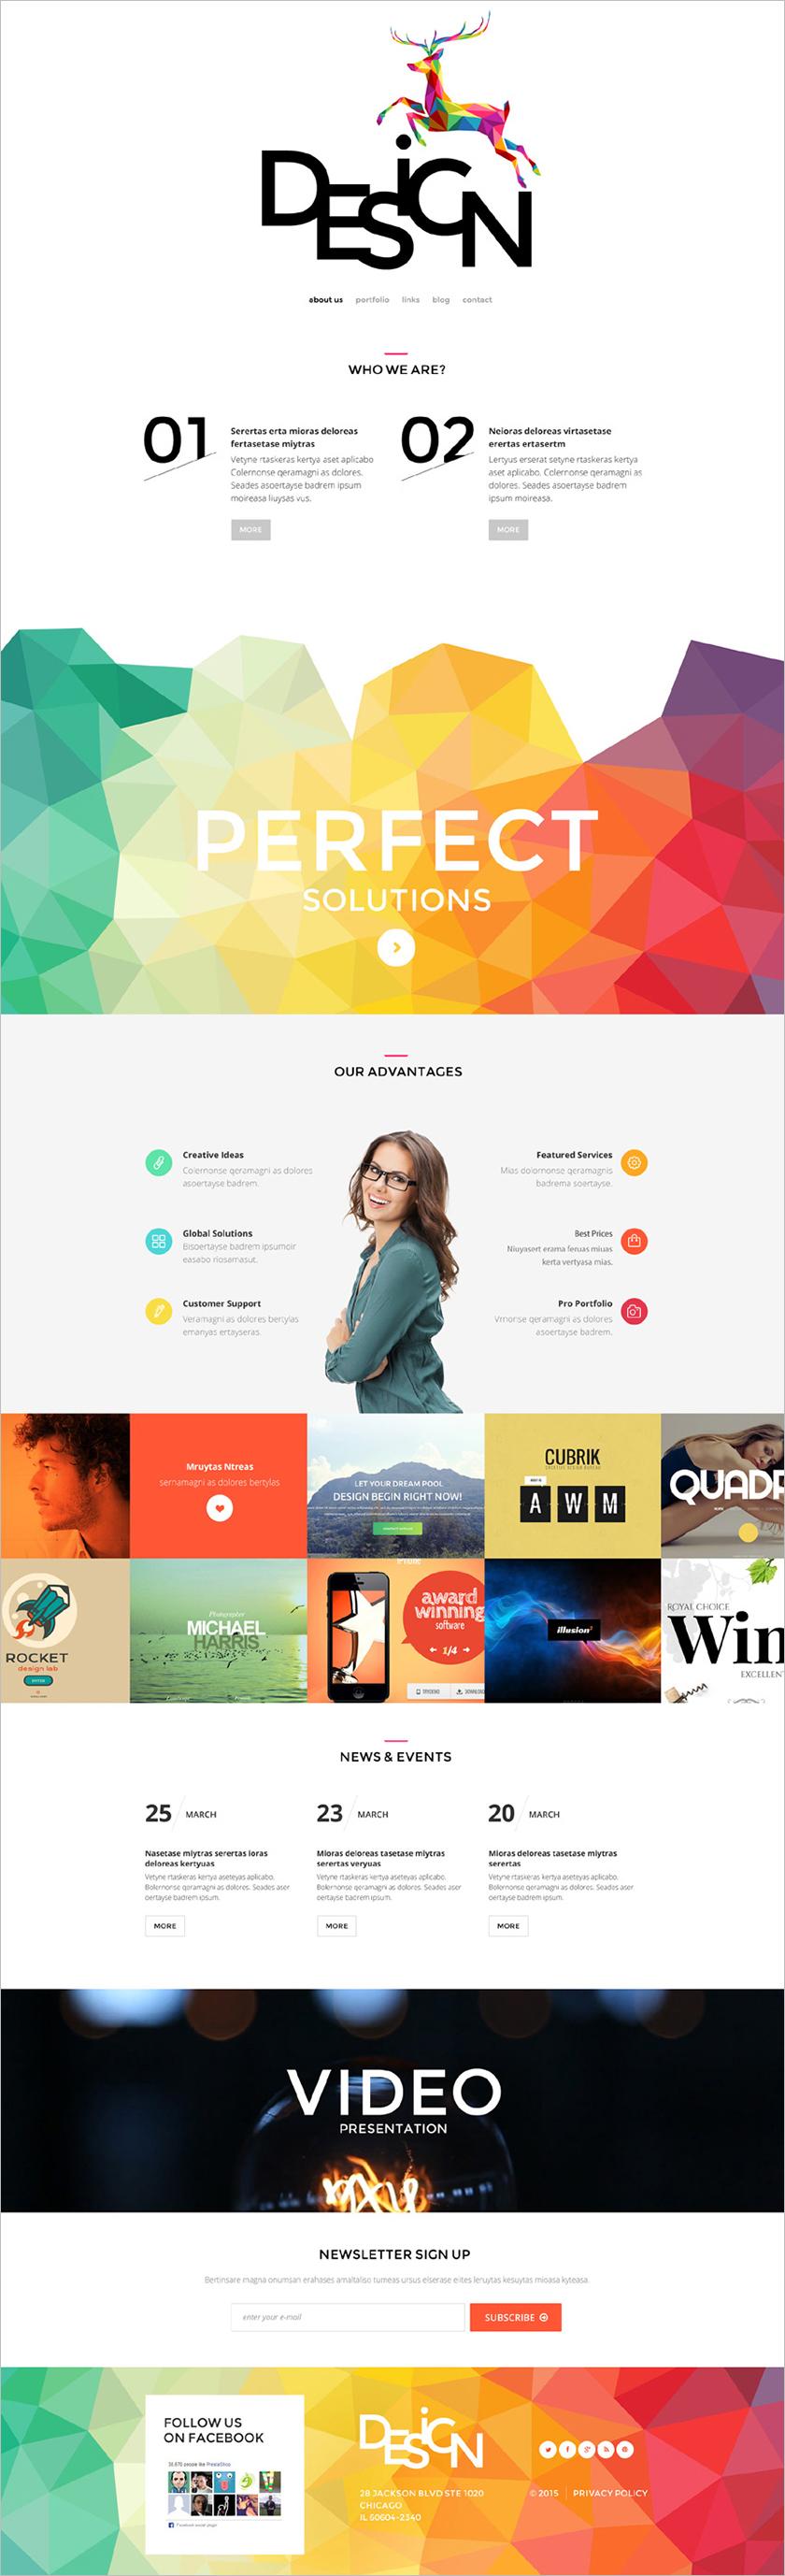 Design Business Blog Joomla Template